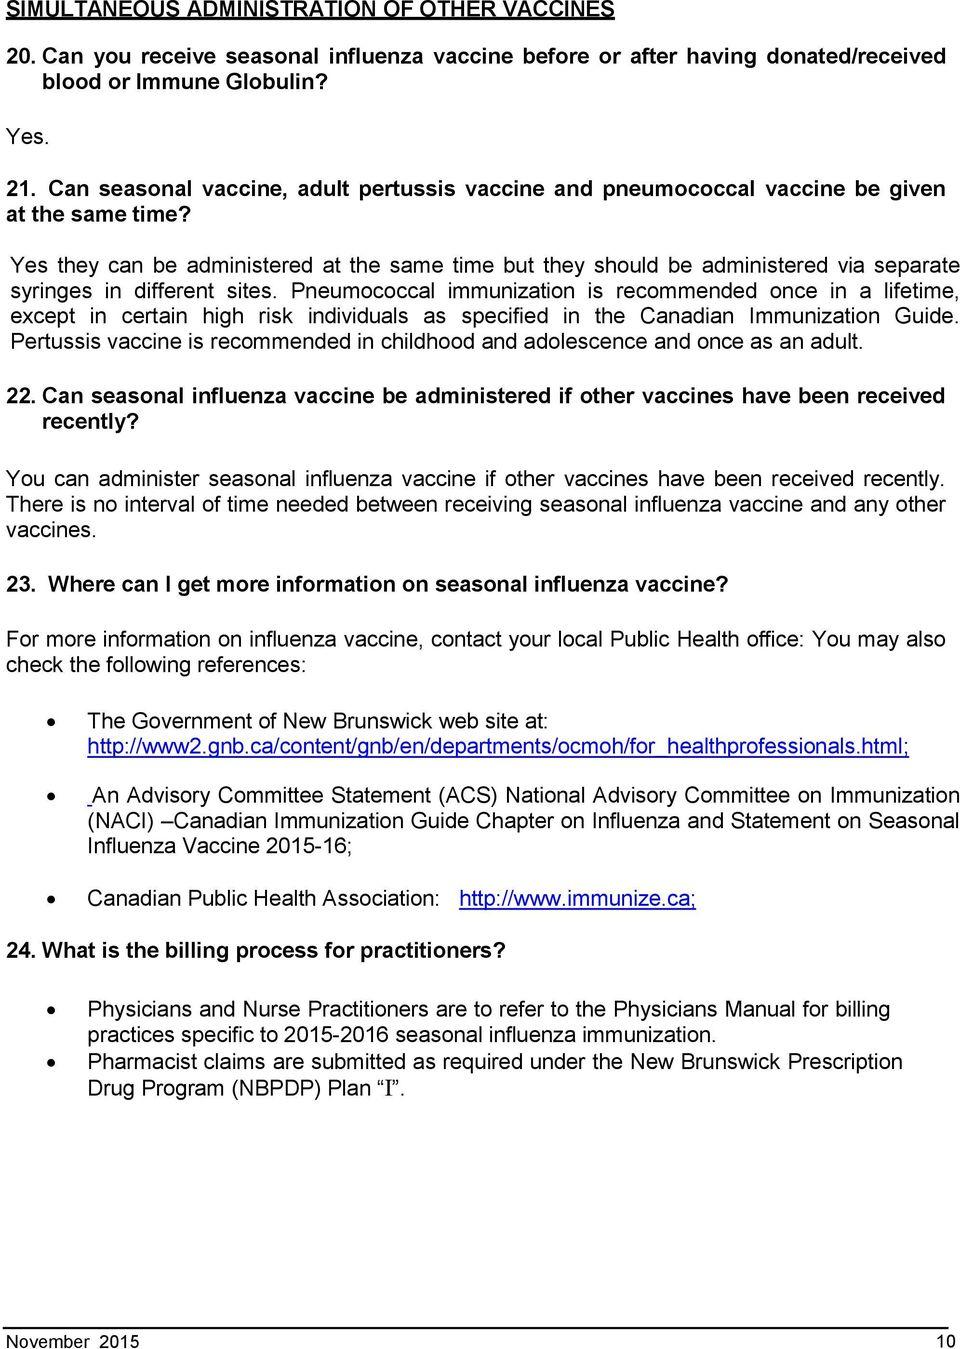 Seasonal Influenza And Pneumococcal Vaccine Consent Form Manitoba